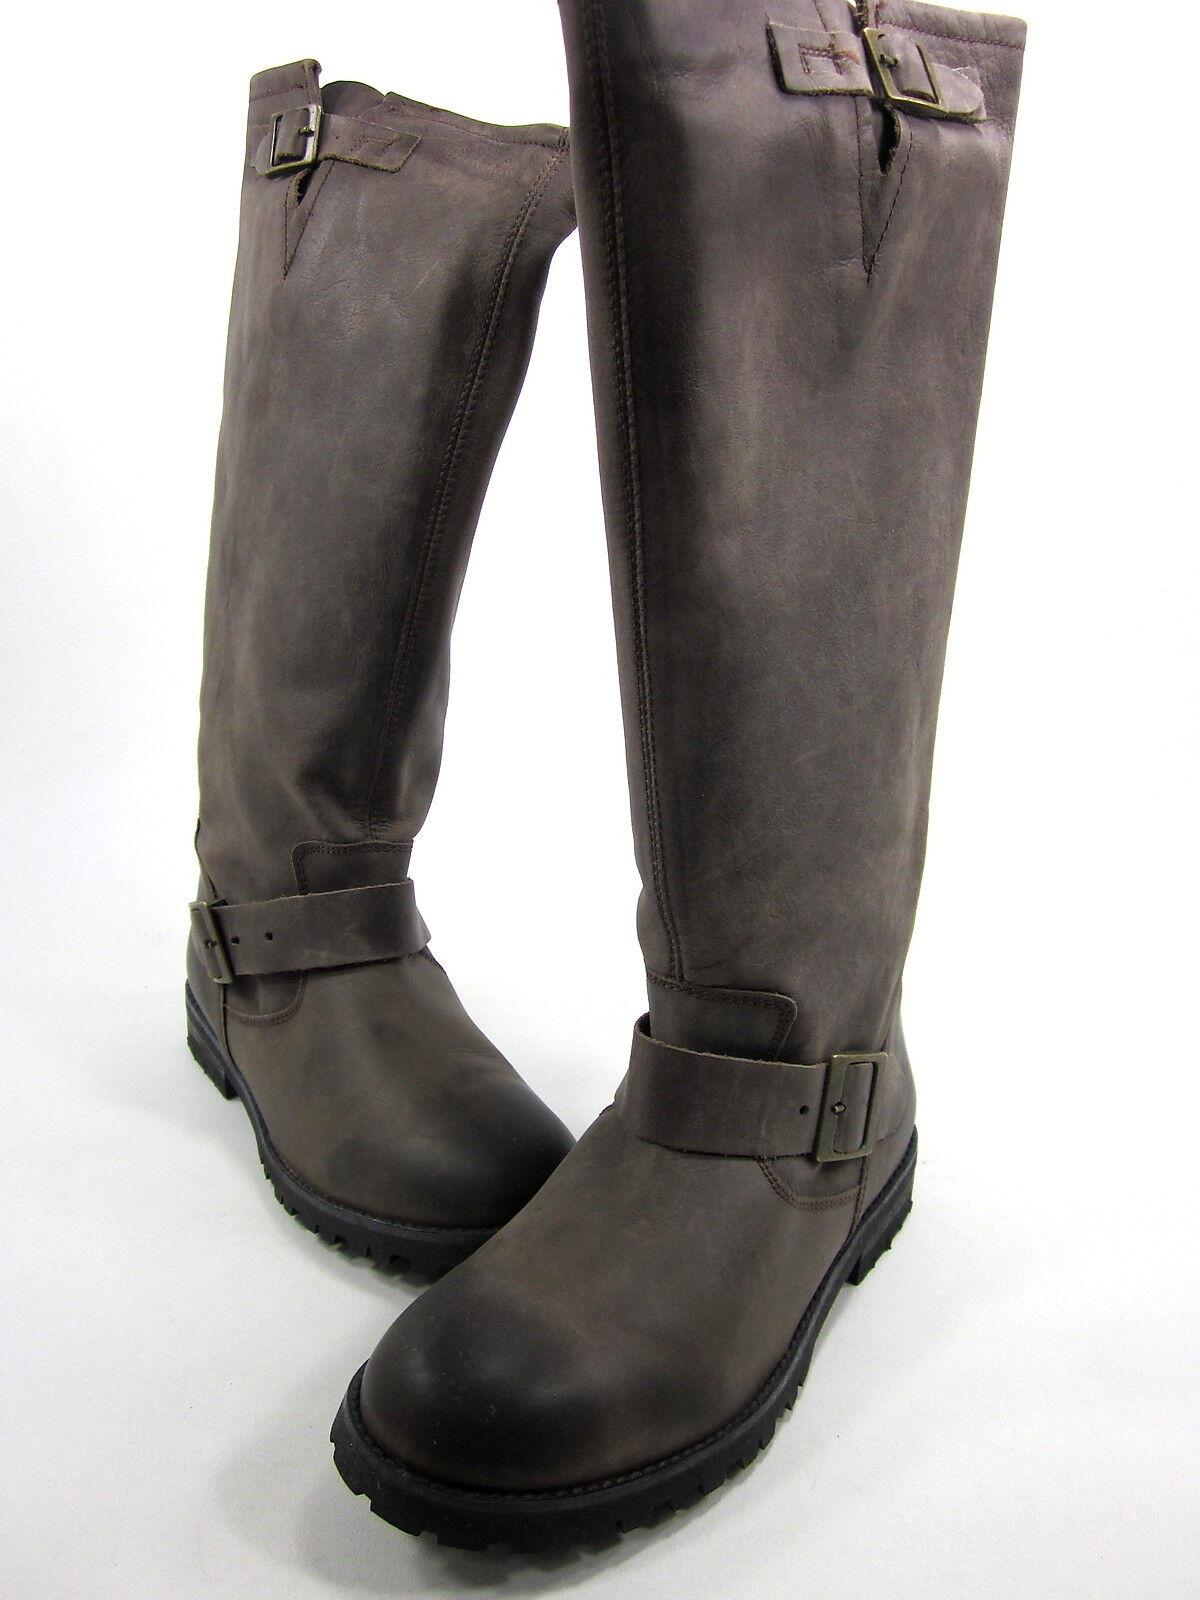 schuhe DIEM, 102 KNEE-HIGH Stiefel, WASHED TAN, damen, US 10M, EURO 40, NEW W O BOX